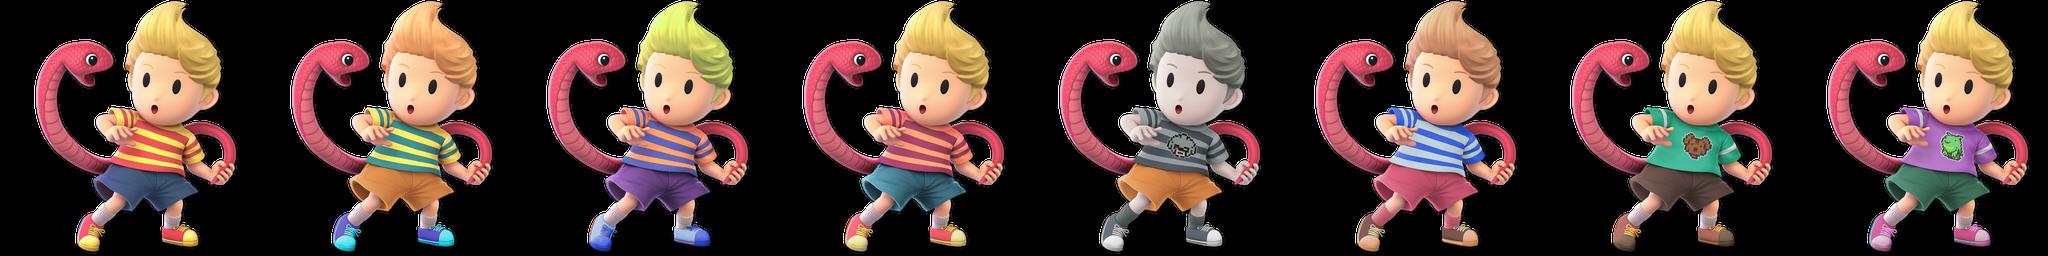 Lucas (Super Smash Bros. Ultimate)